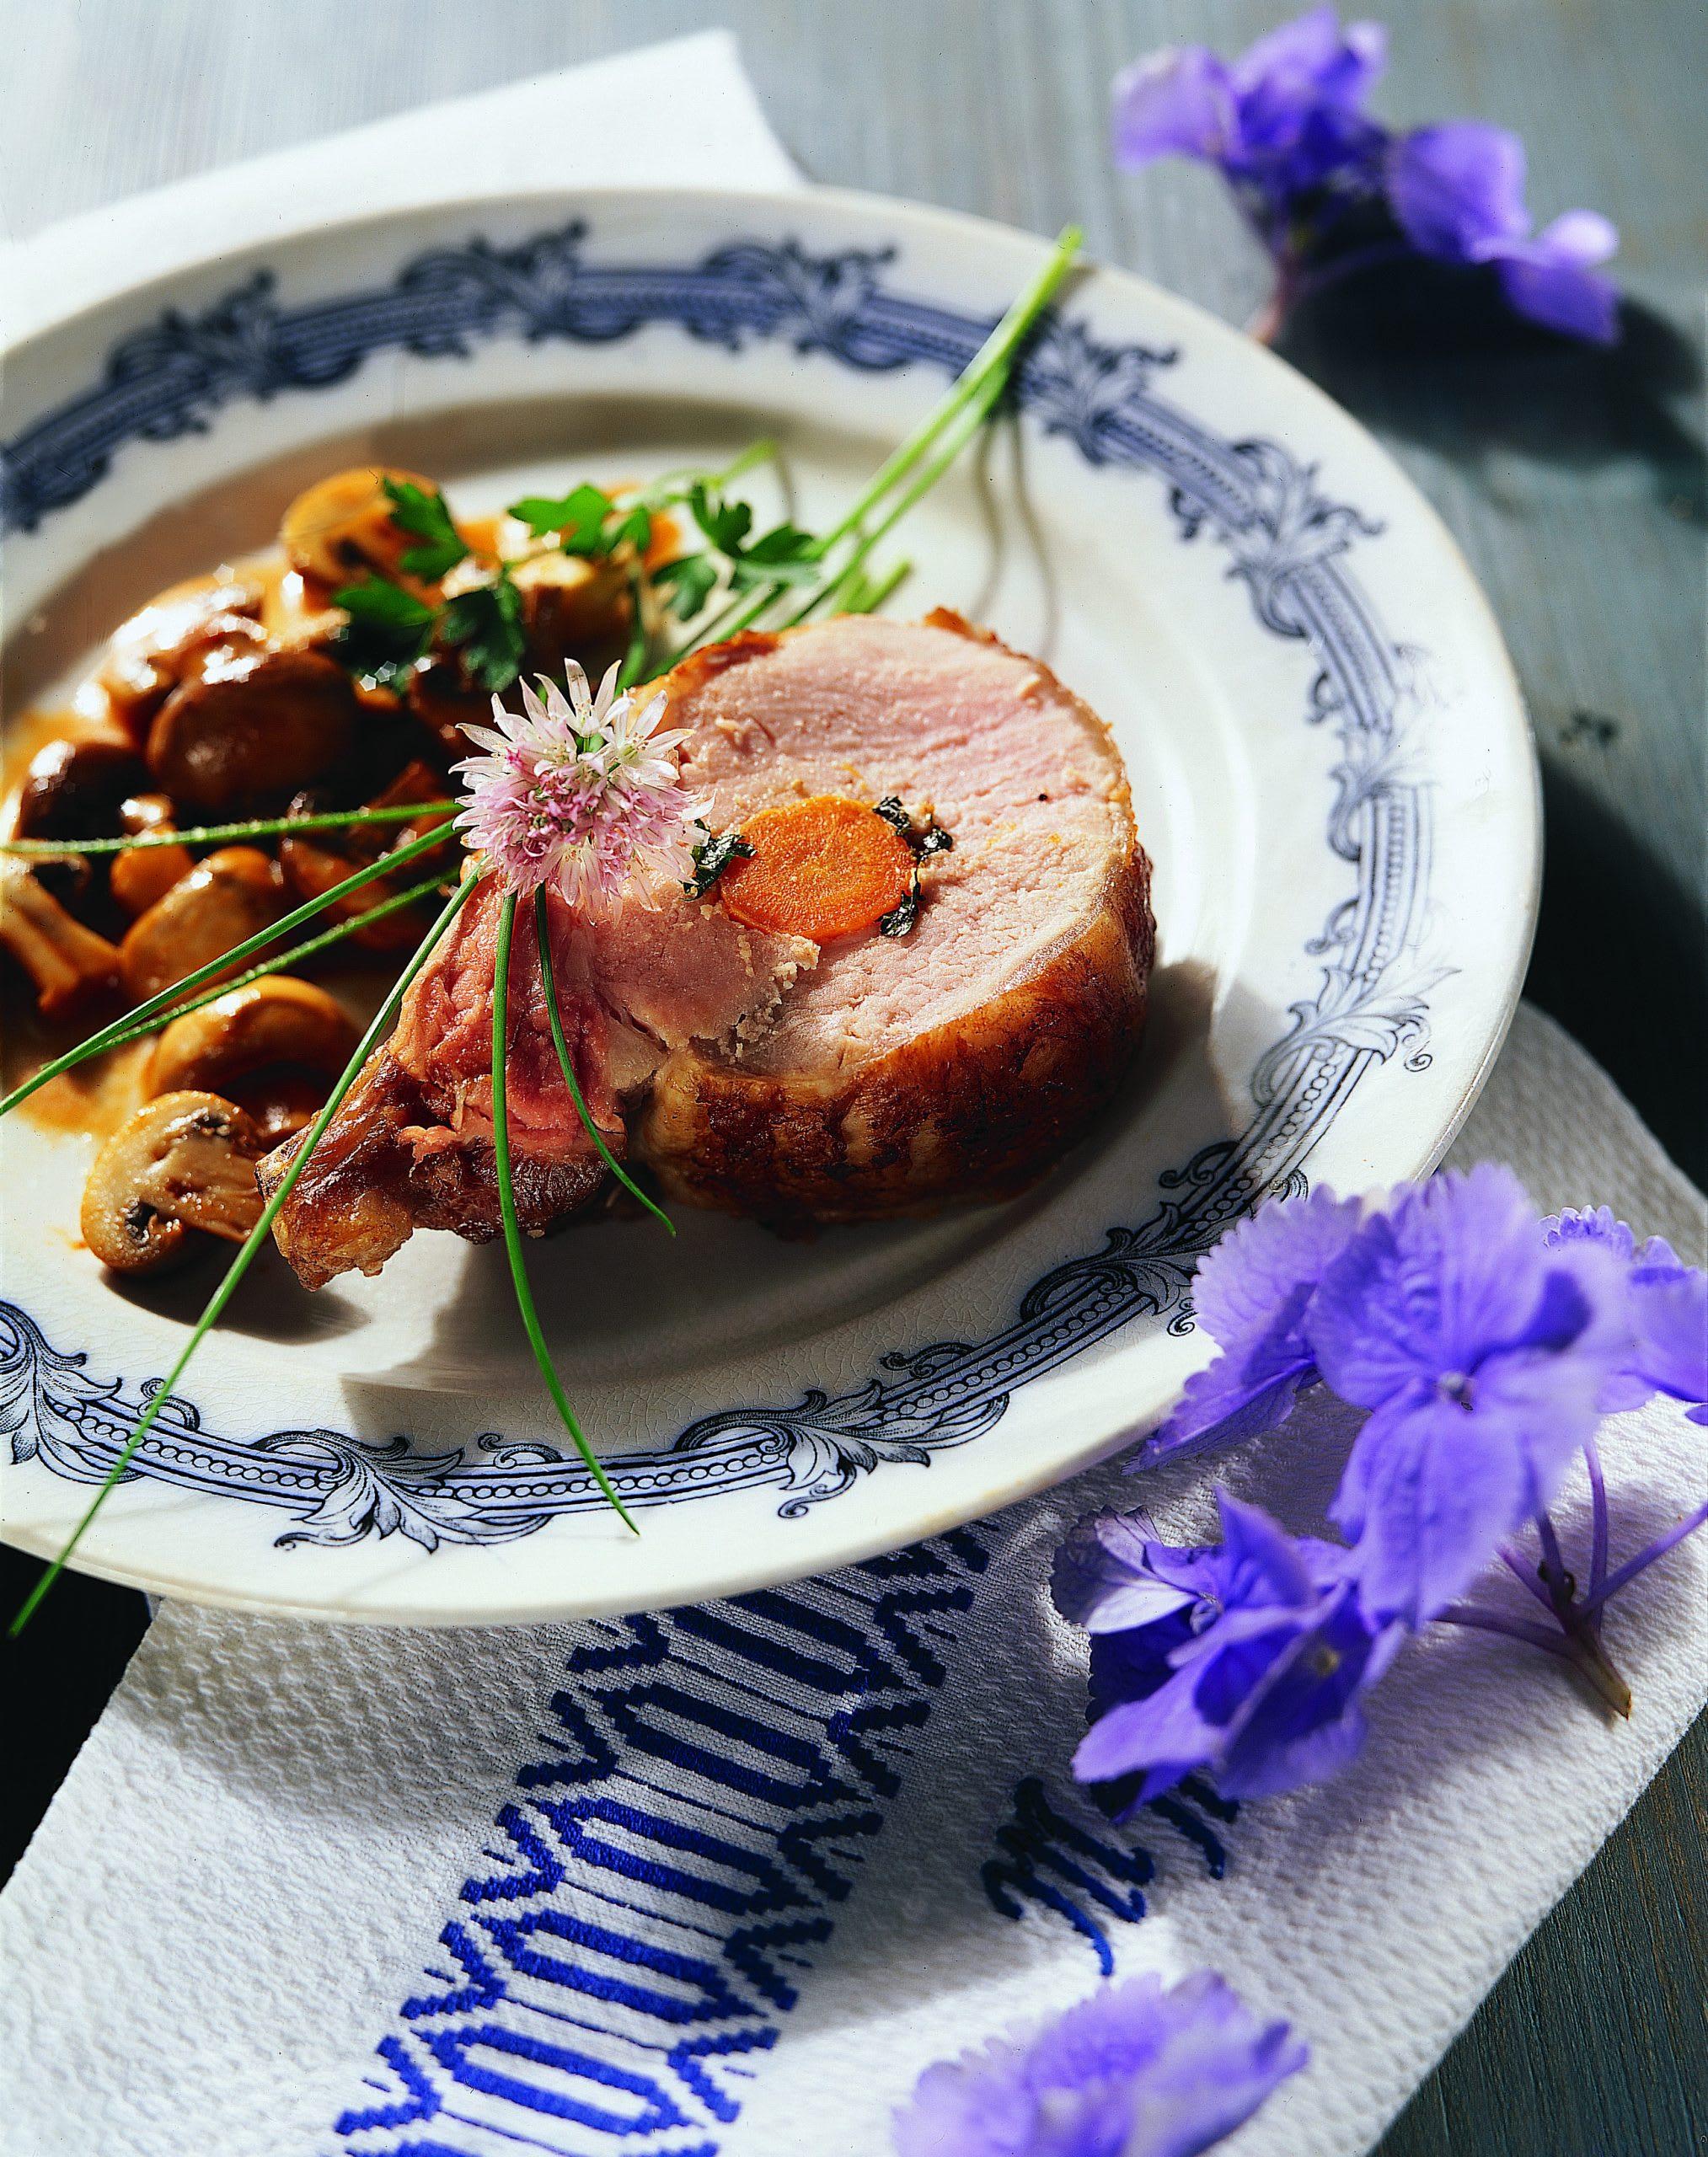 Svinjska pecenka na nacin visoko z gobicami (Schweinsbraten nach Visoko-Art mit Champignonsauce)